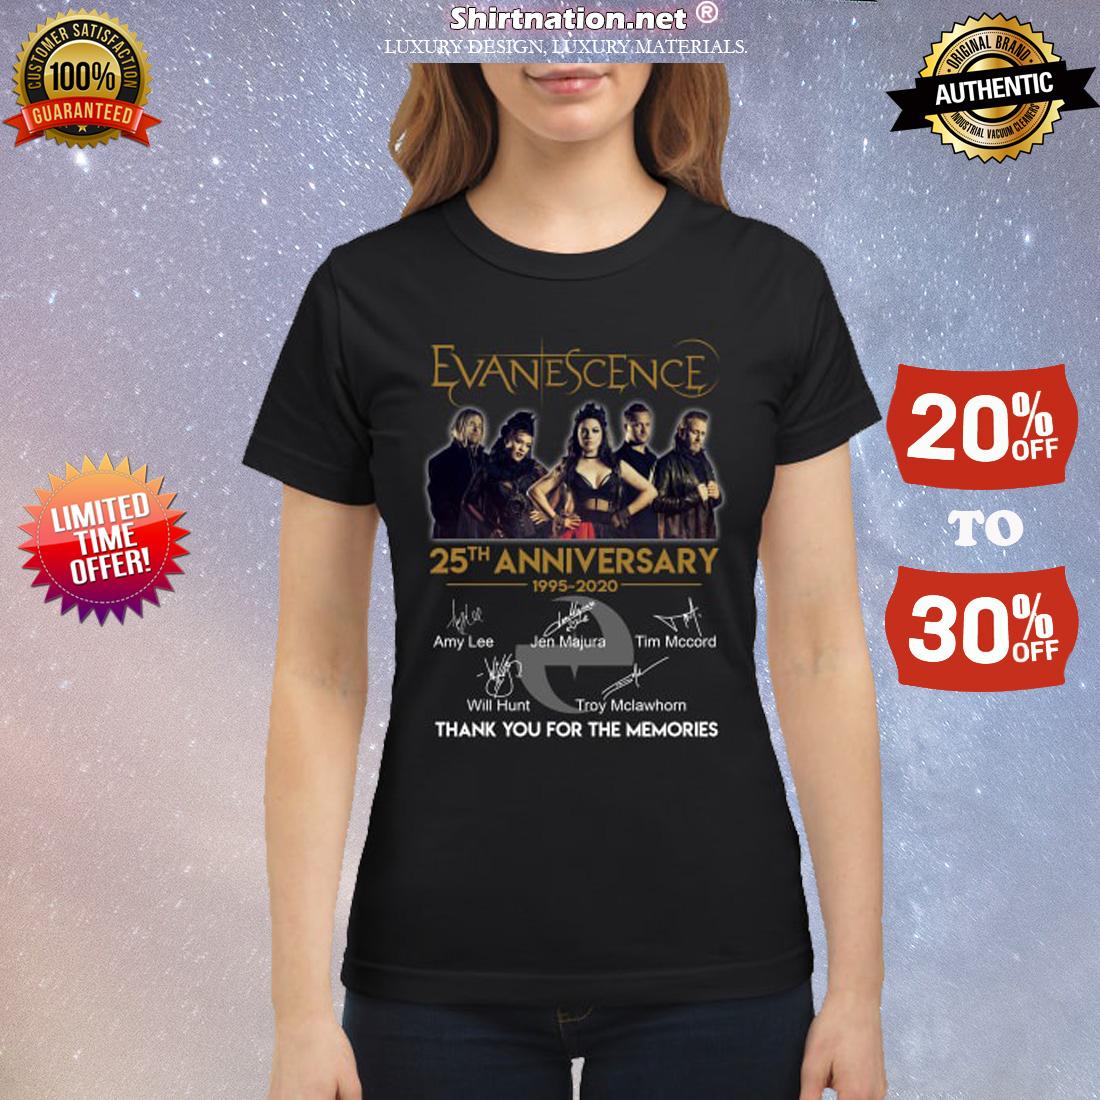 Evanescence 25th anniversary classic shirt